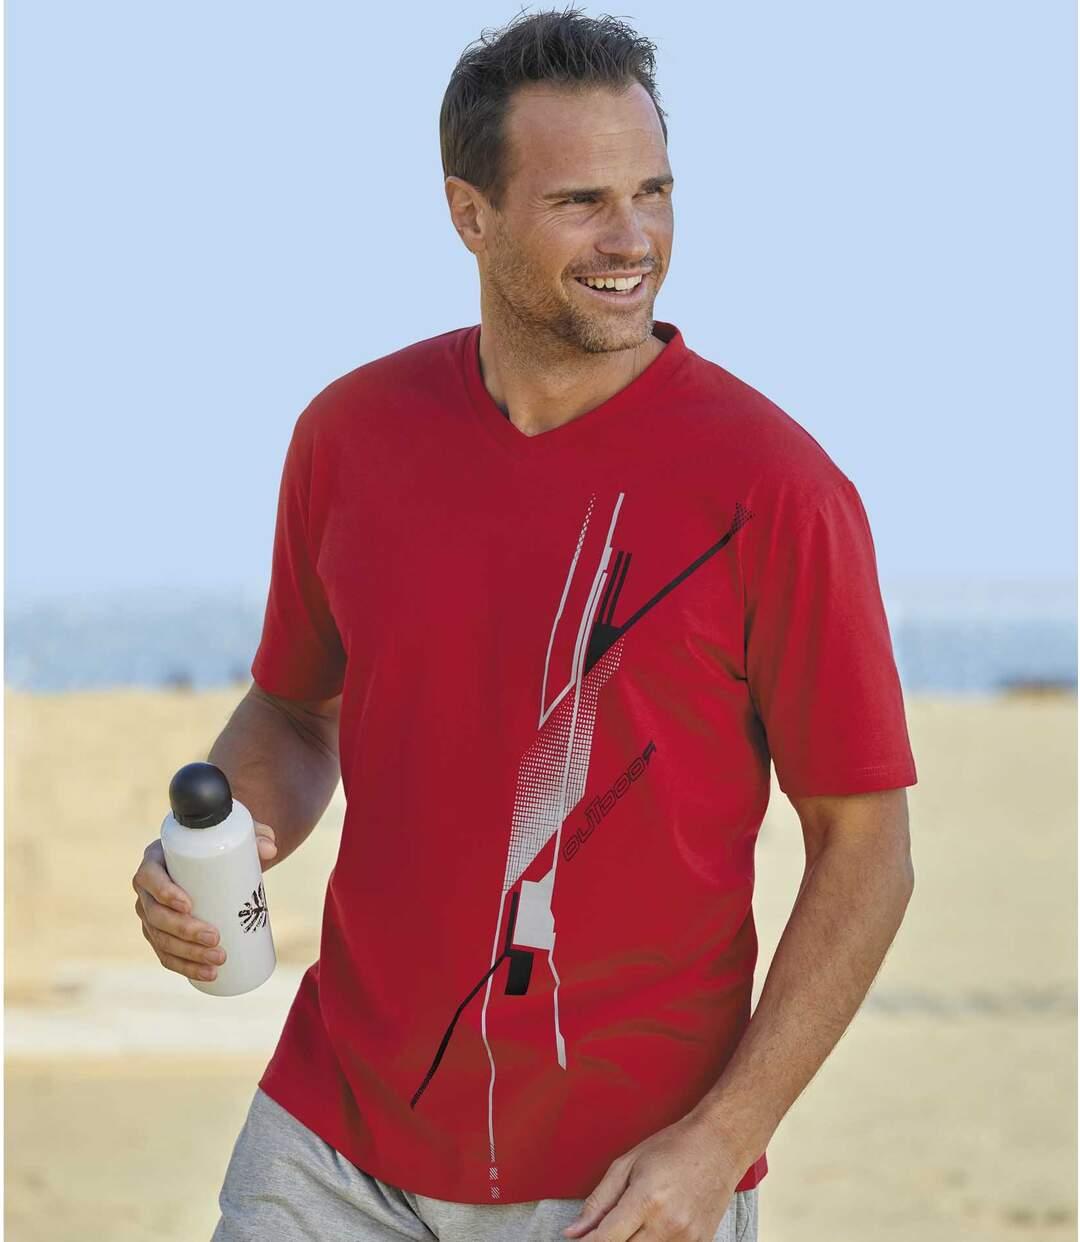 Pack of 6 Men's V-Neck Graphic Print T-Shirts - Red, Blue, White, Black